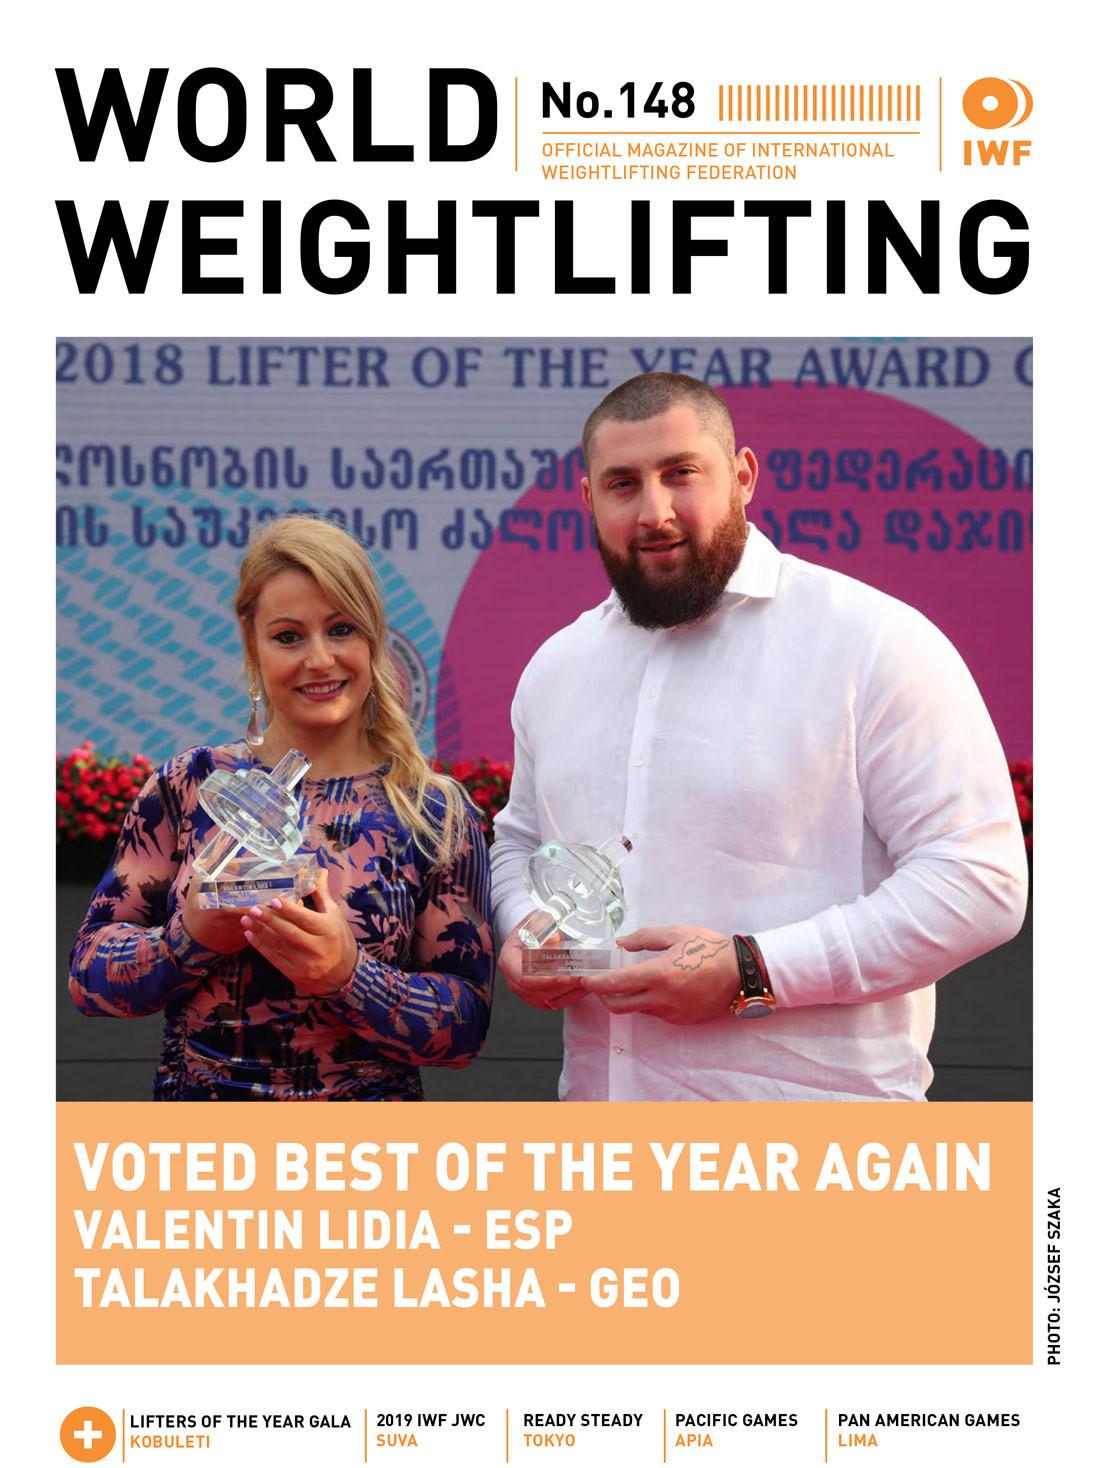 World Weightlifting Magazine No. 148